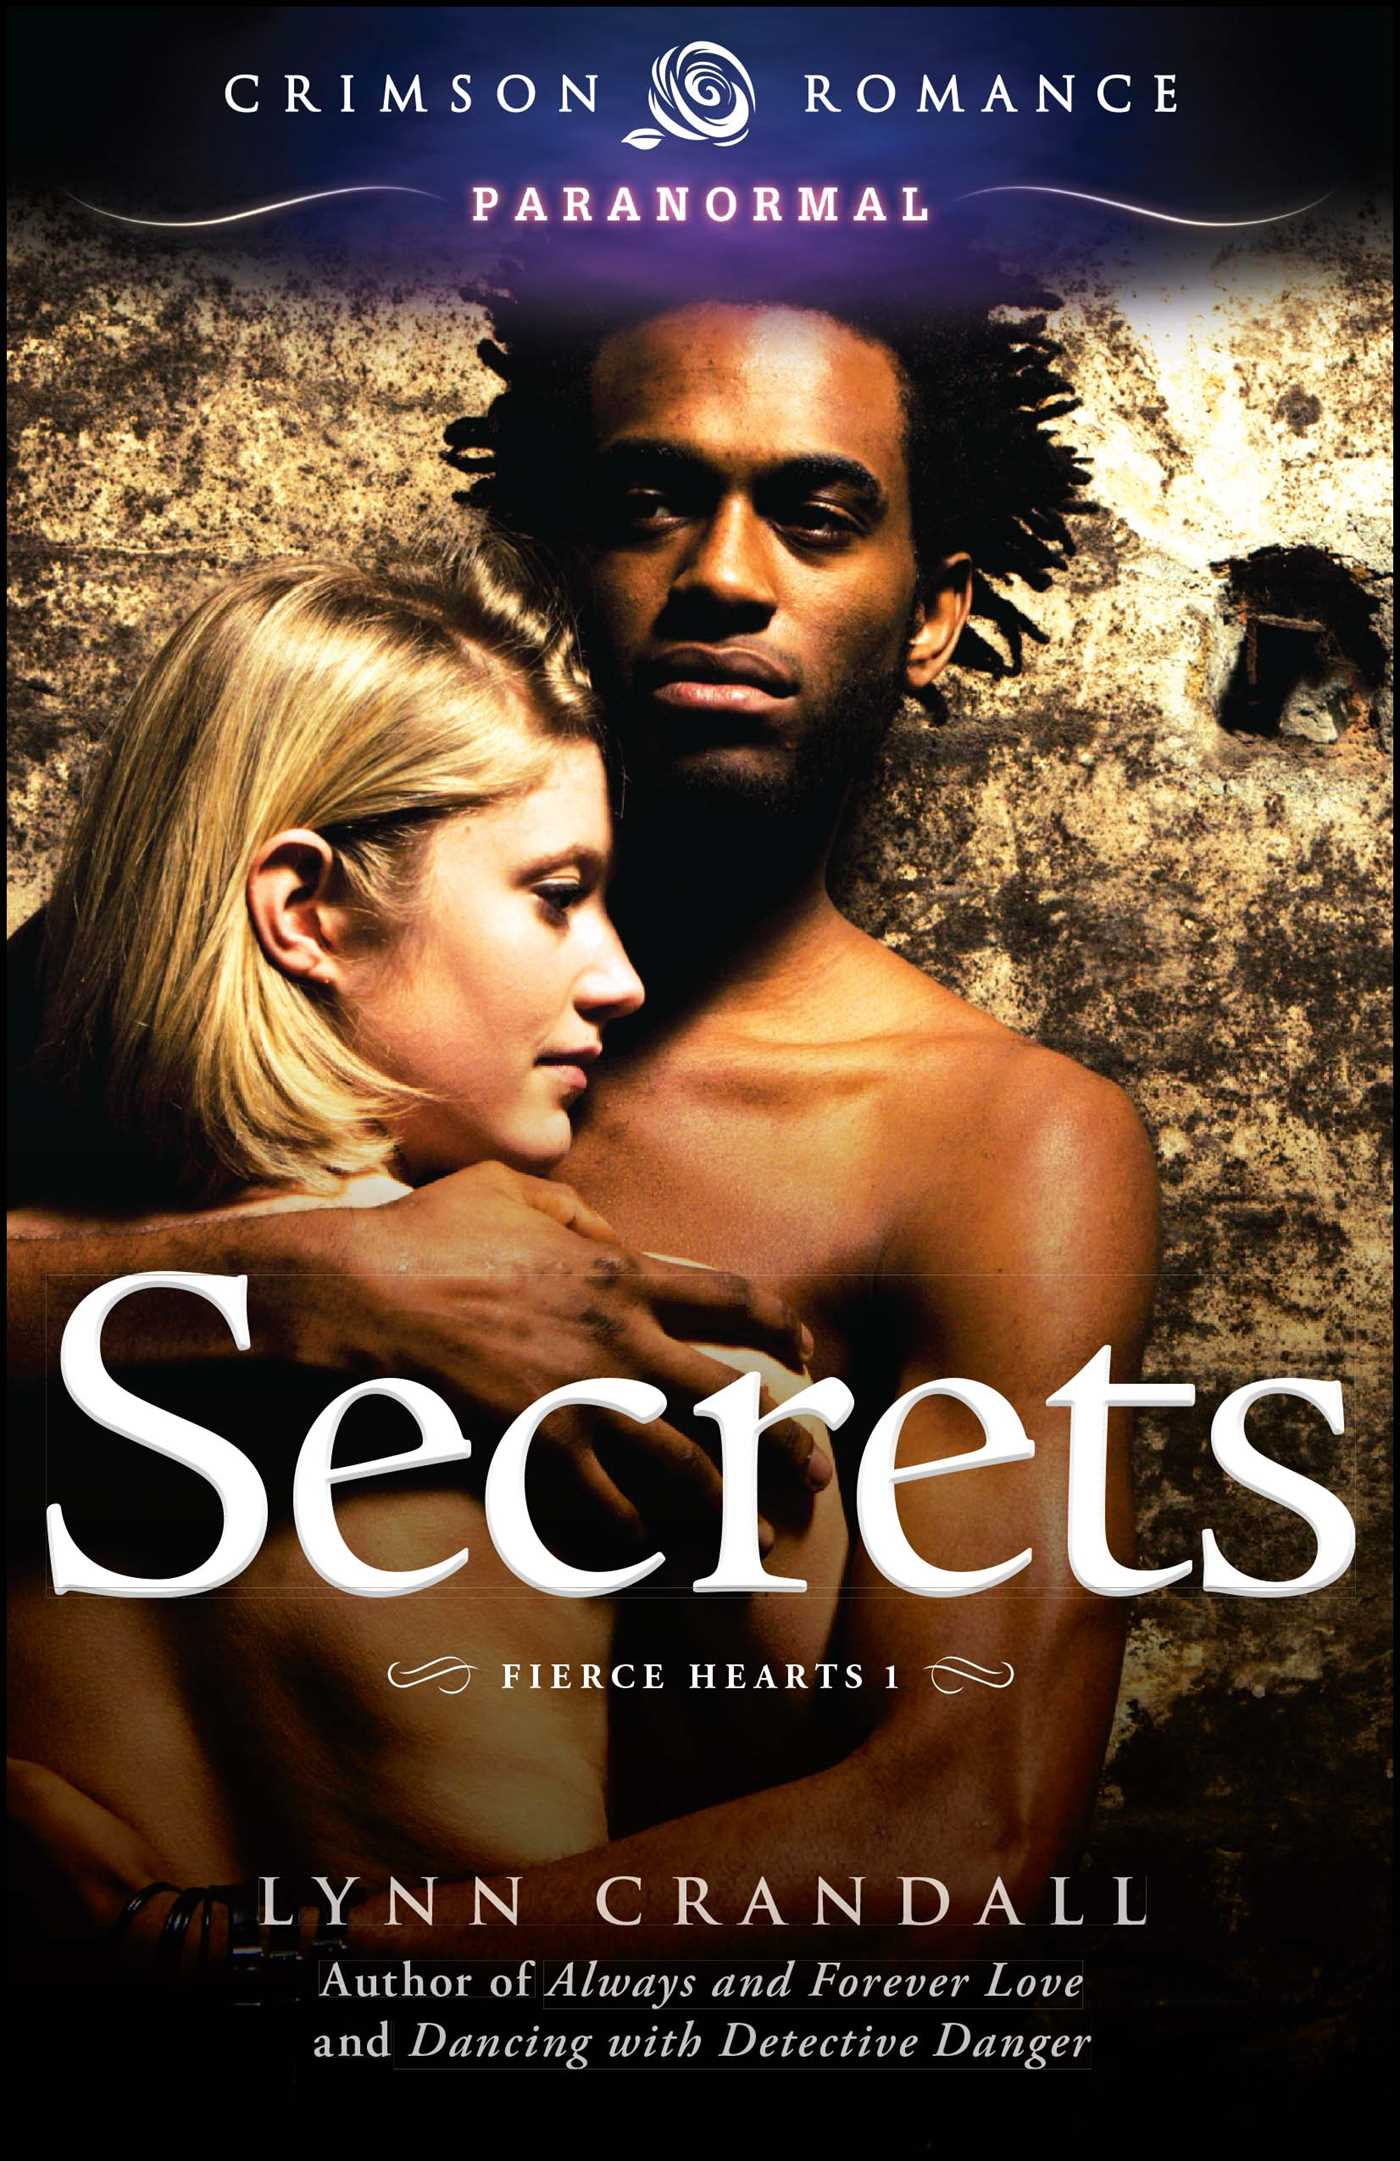 Secrets 9781440586040 hr